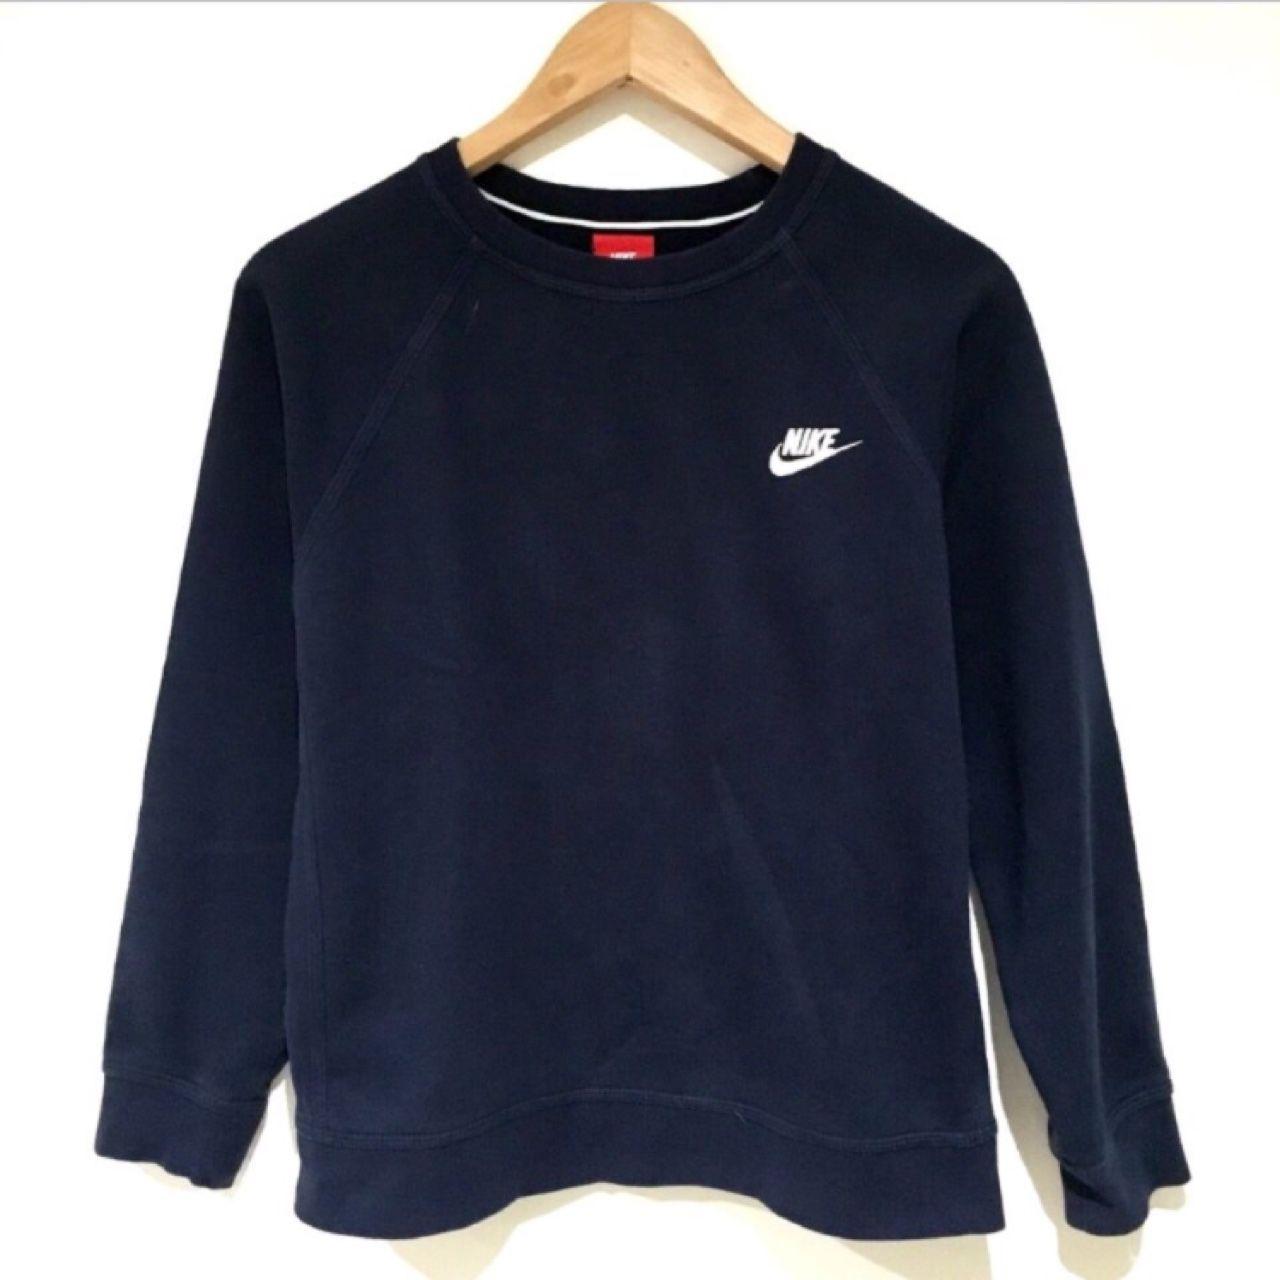 9ec44c03 Nike sweatshirt jumper, navy, boys XL. MEASUREMENTS: pit to pit 20.5